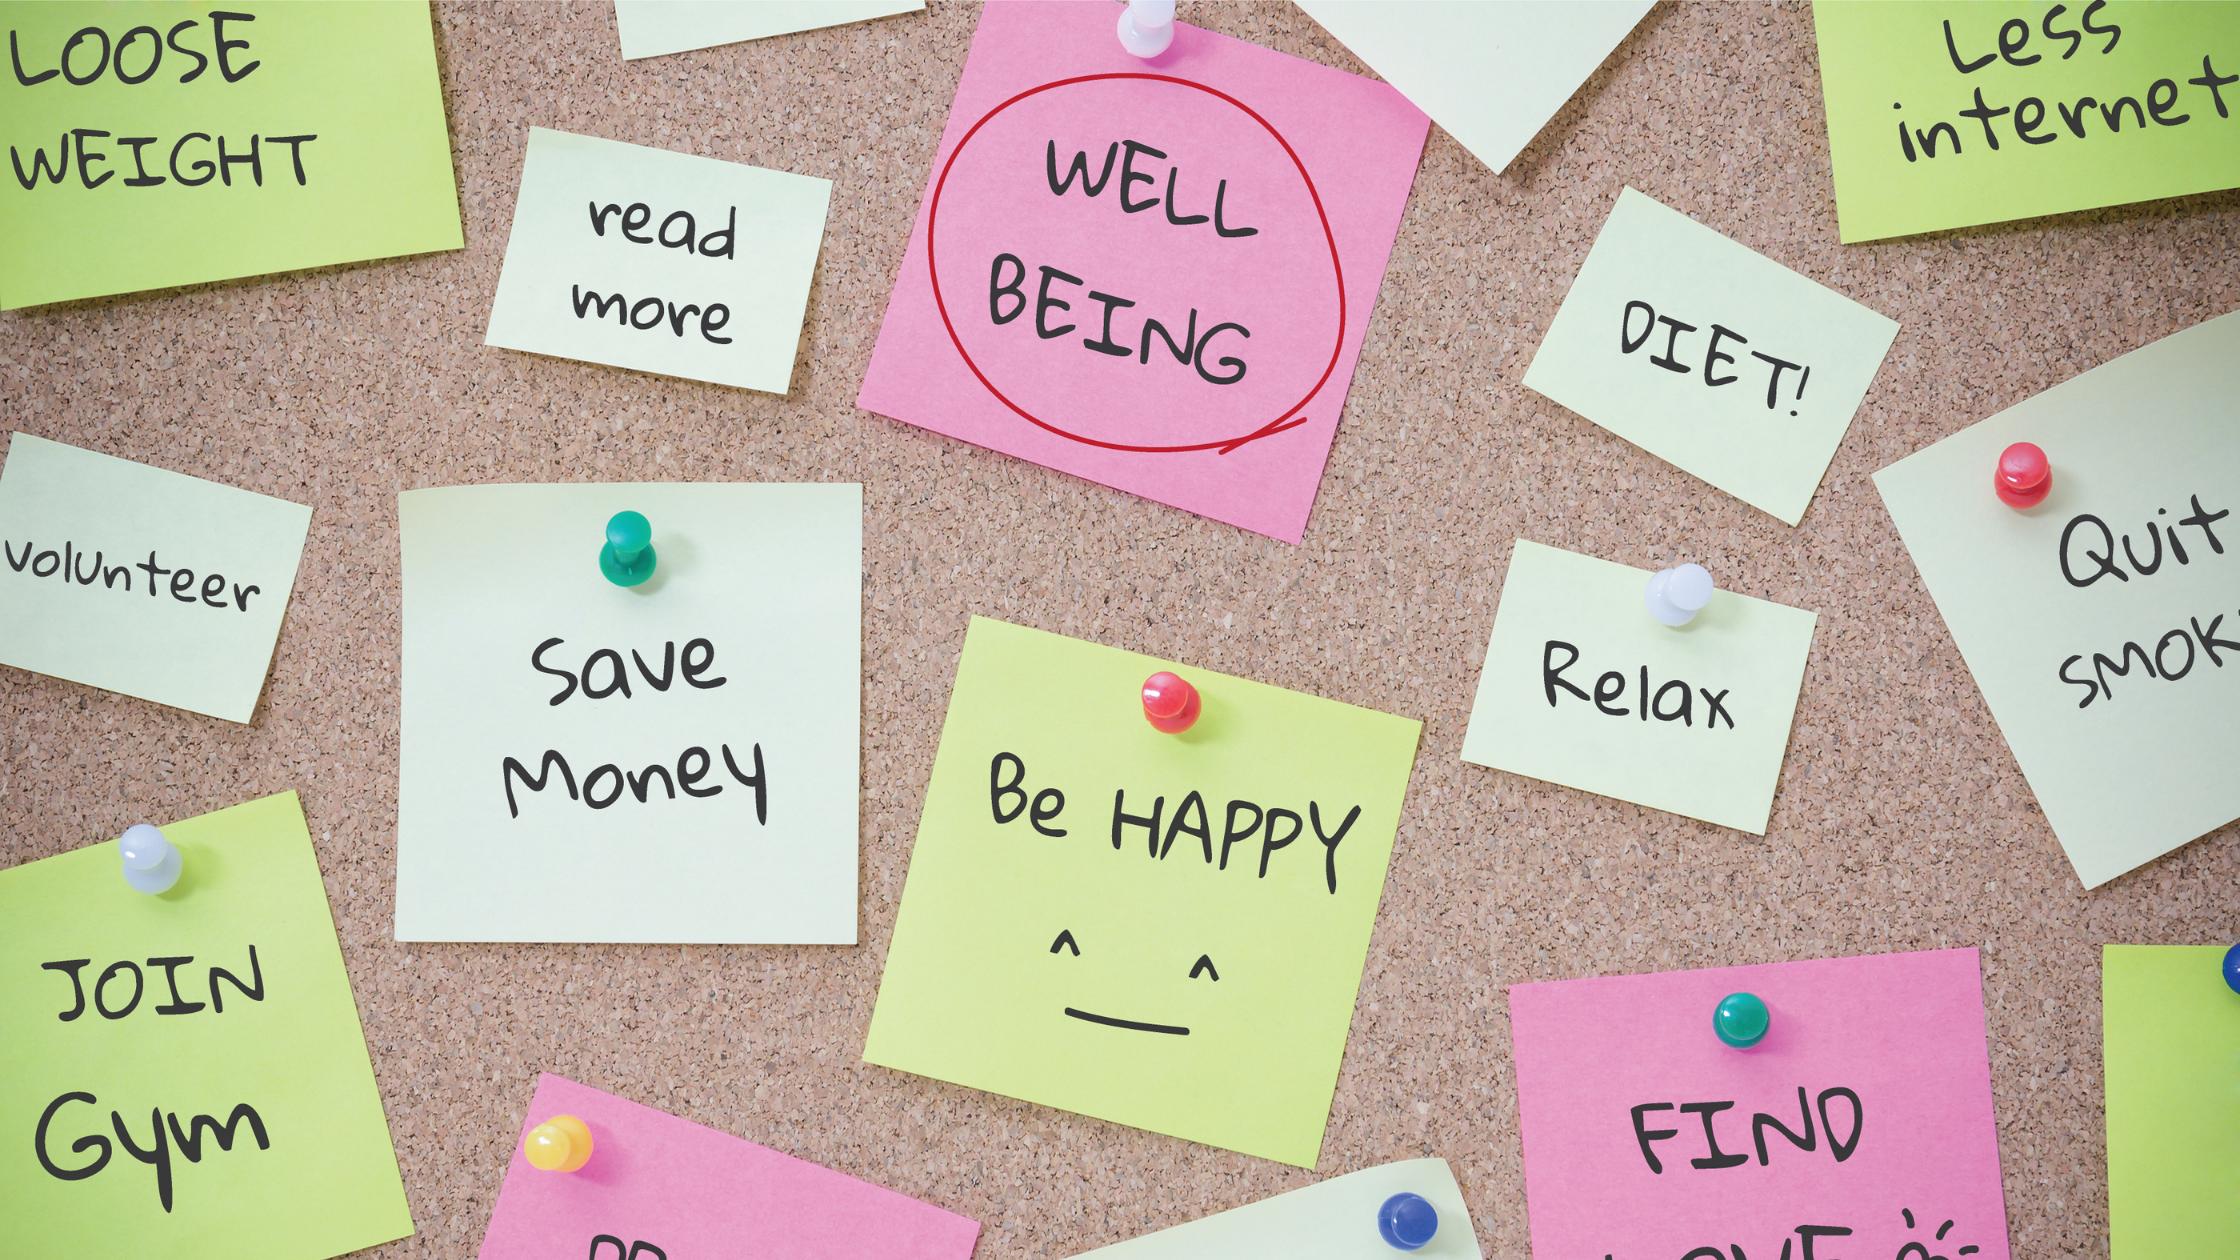 boosting employee wellbeing